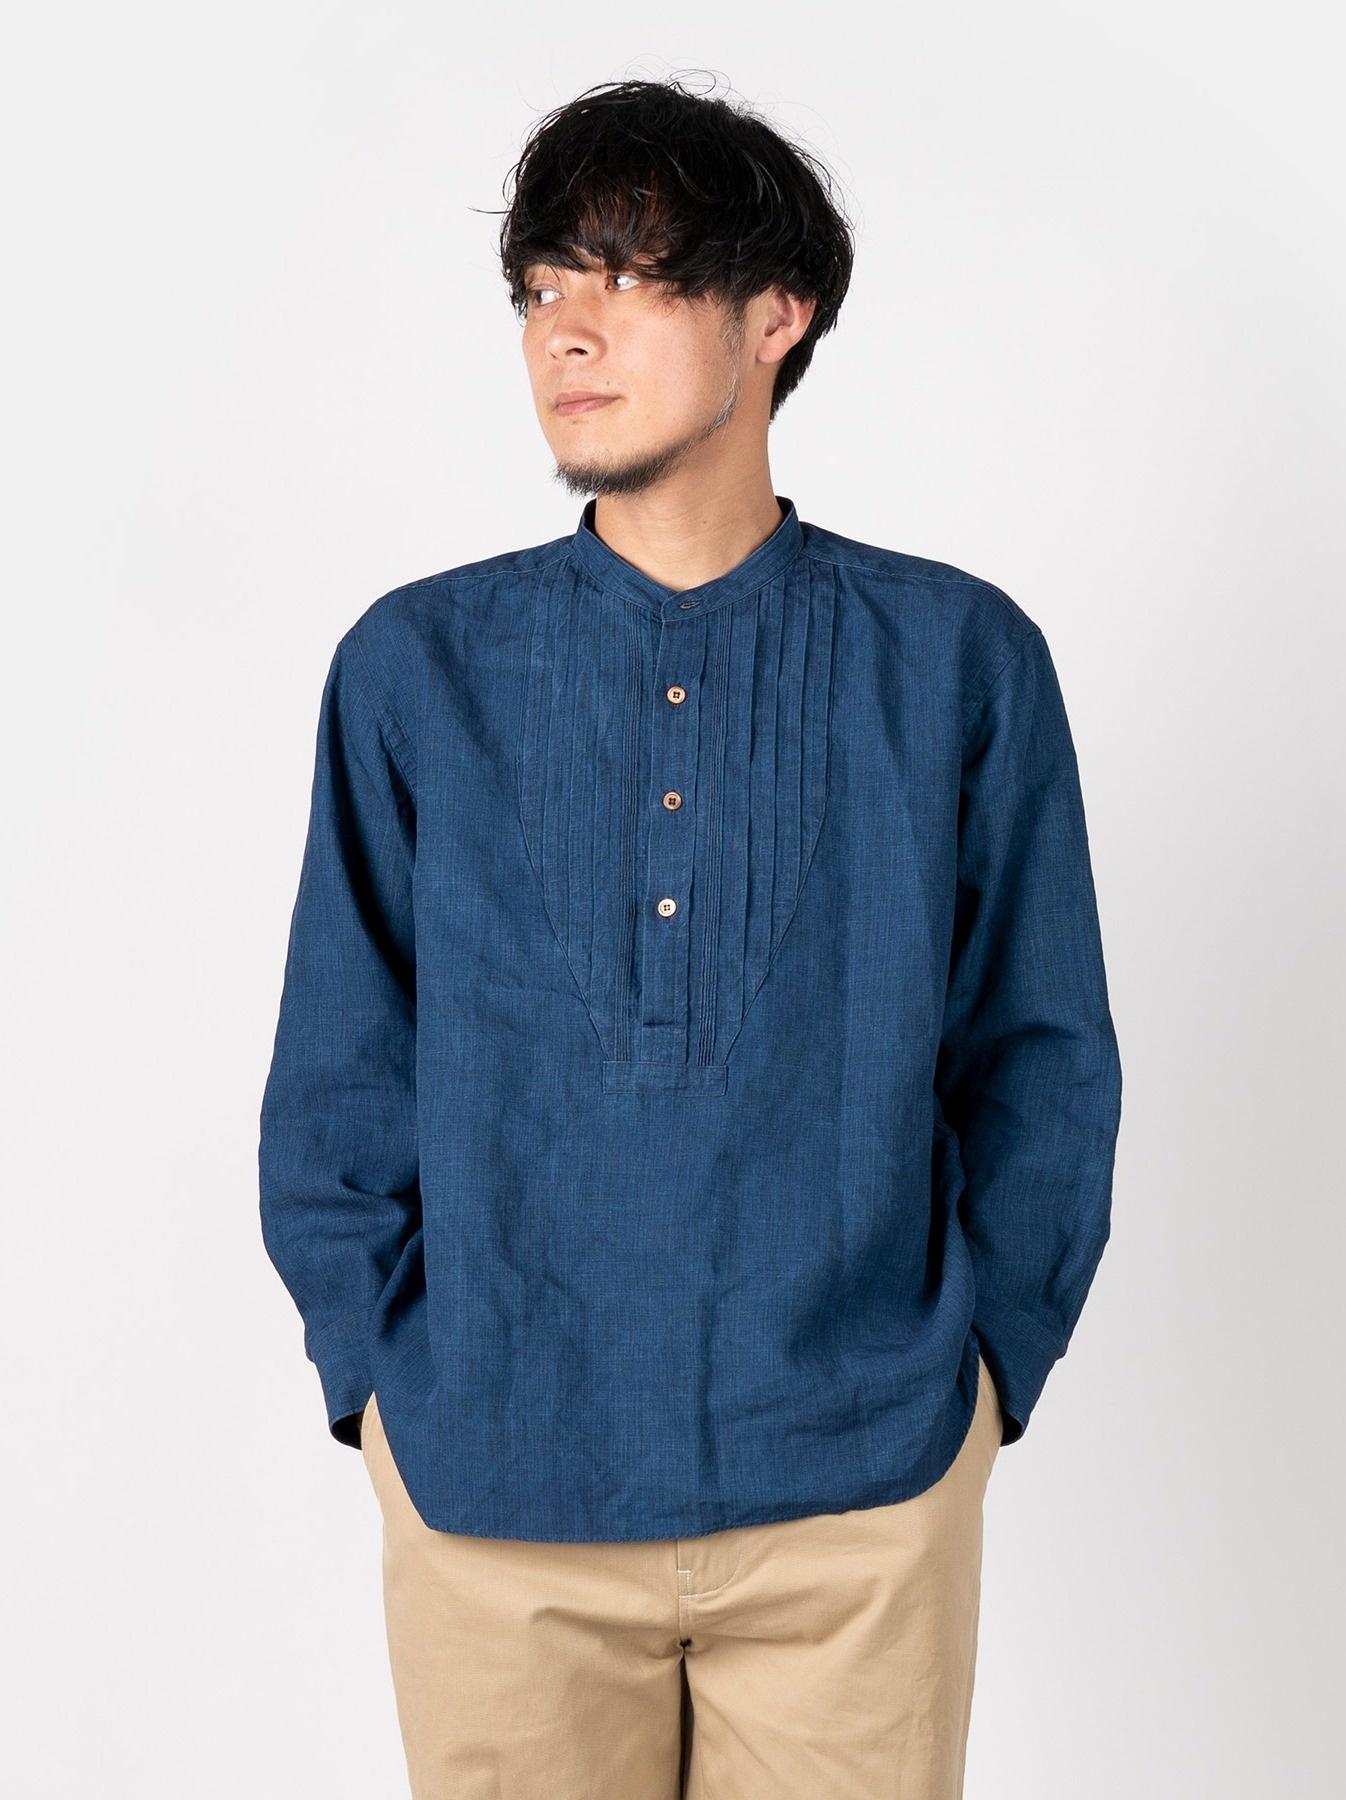 WH Indigo Linen Pin-tuck 908 Shirt-2